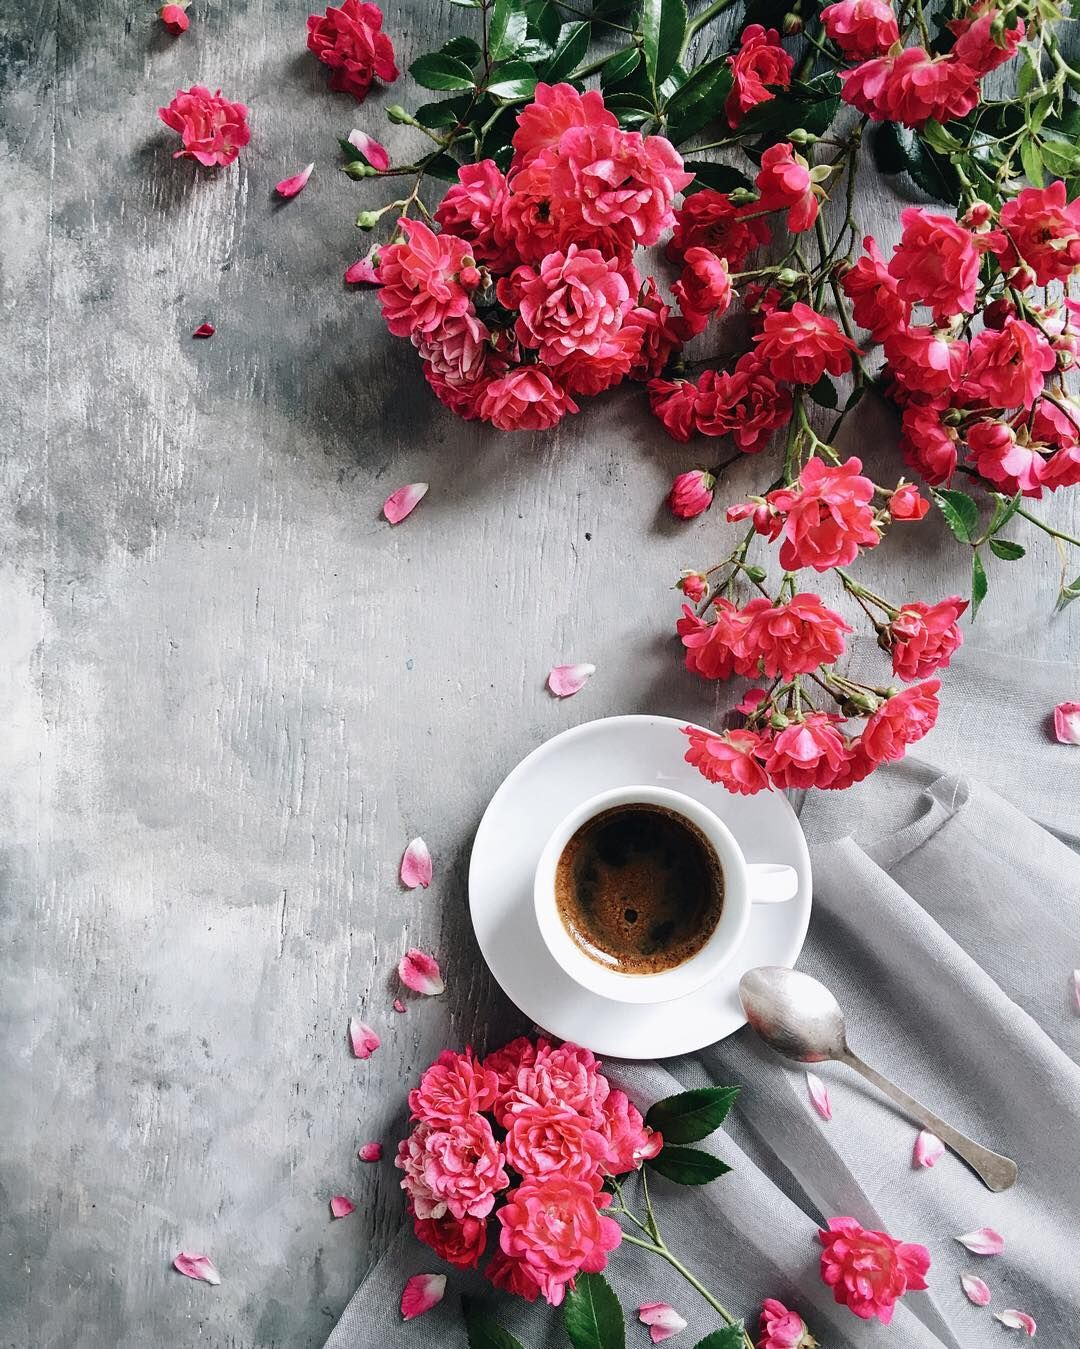 "8,597 Likes, 97 Comments - France • Côte d'Azur • Nice (@evgeniya.prinsloo) on Instagram: ""Morning coffee & rosesHave a day filled with wonders❤️Утренний кофе и розы,пусть день будет…"""